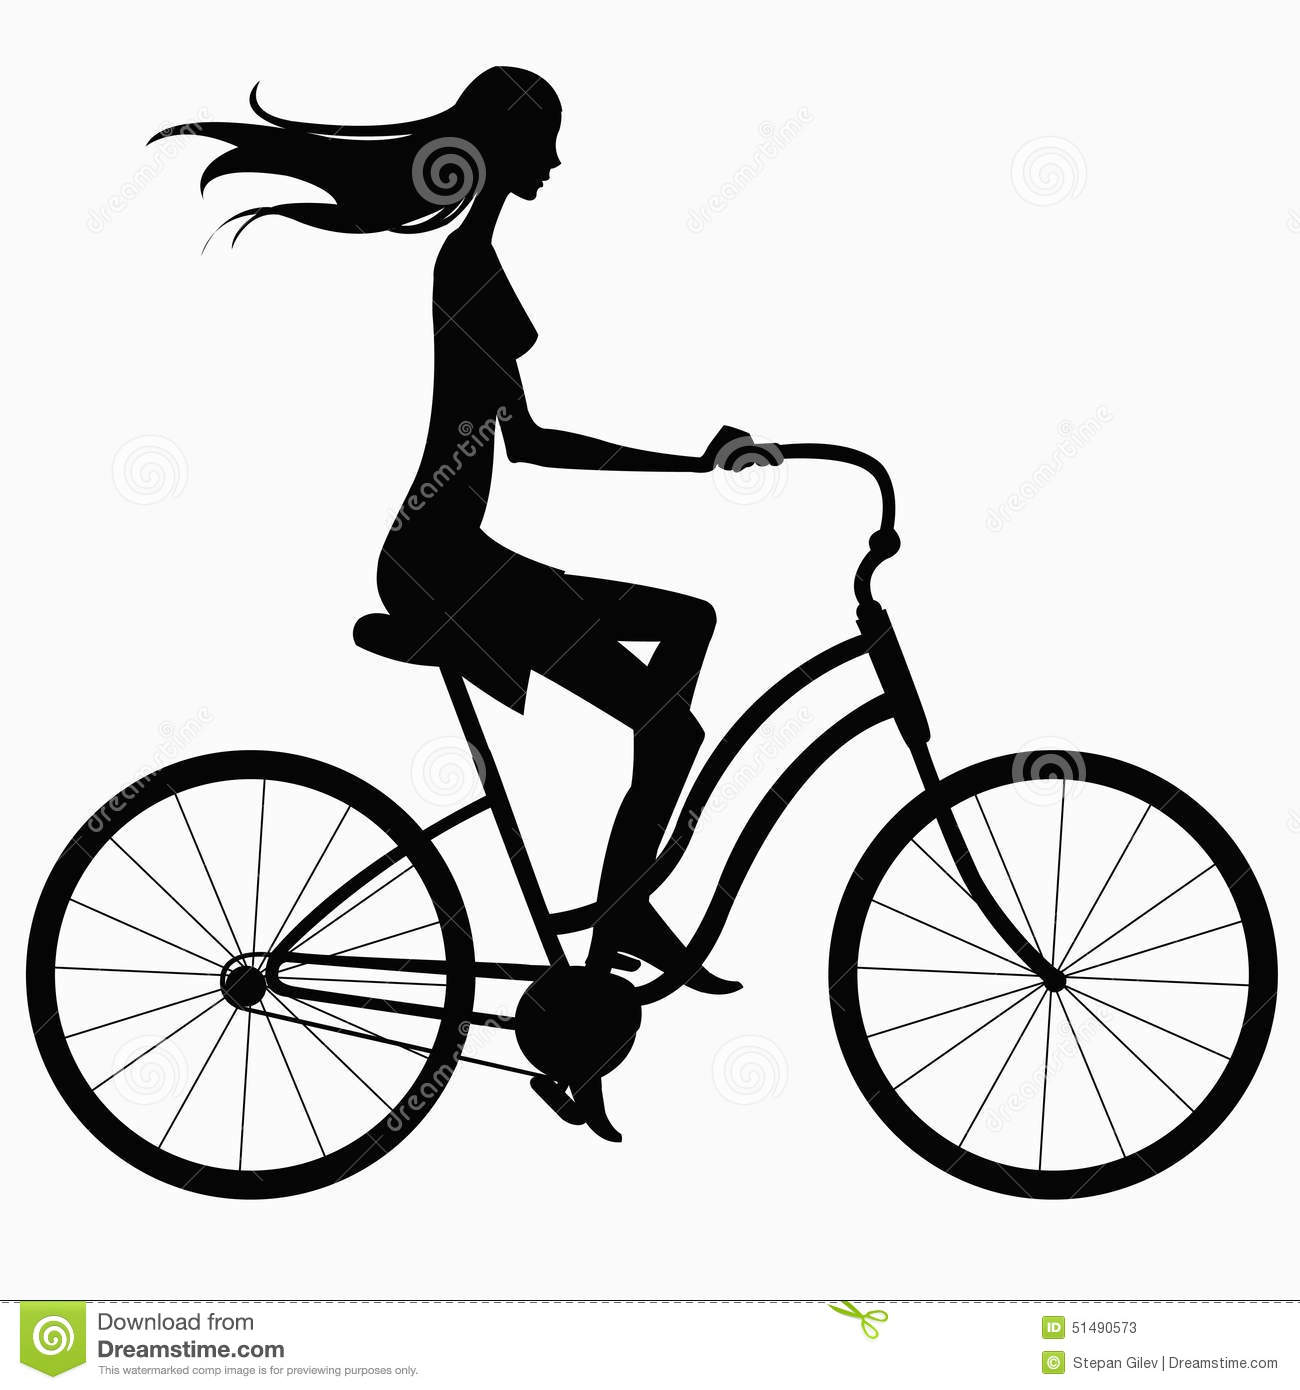 girl biking clipart black and white - Clipground for Bicycle Clipart Black And White  75tgx